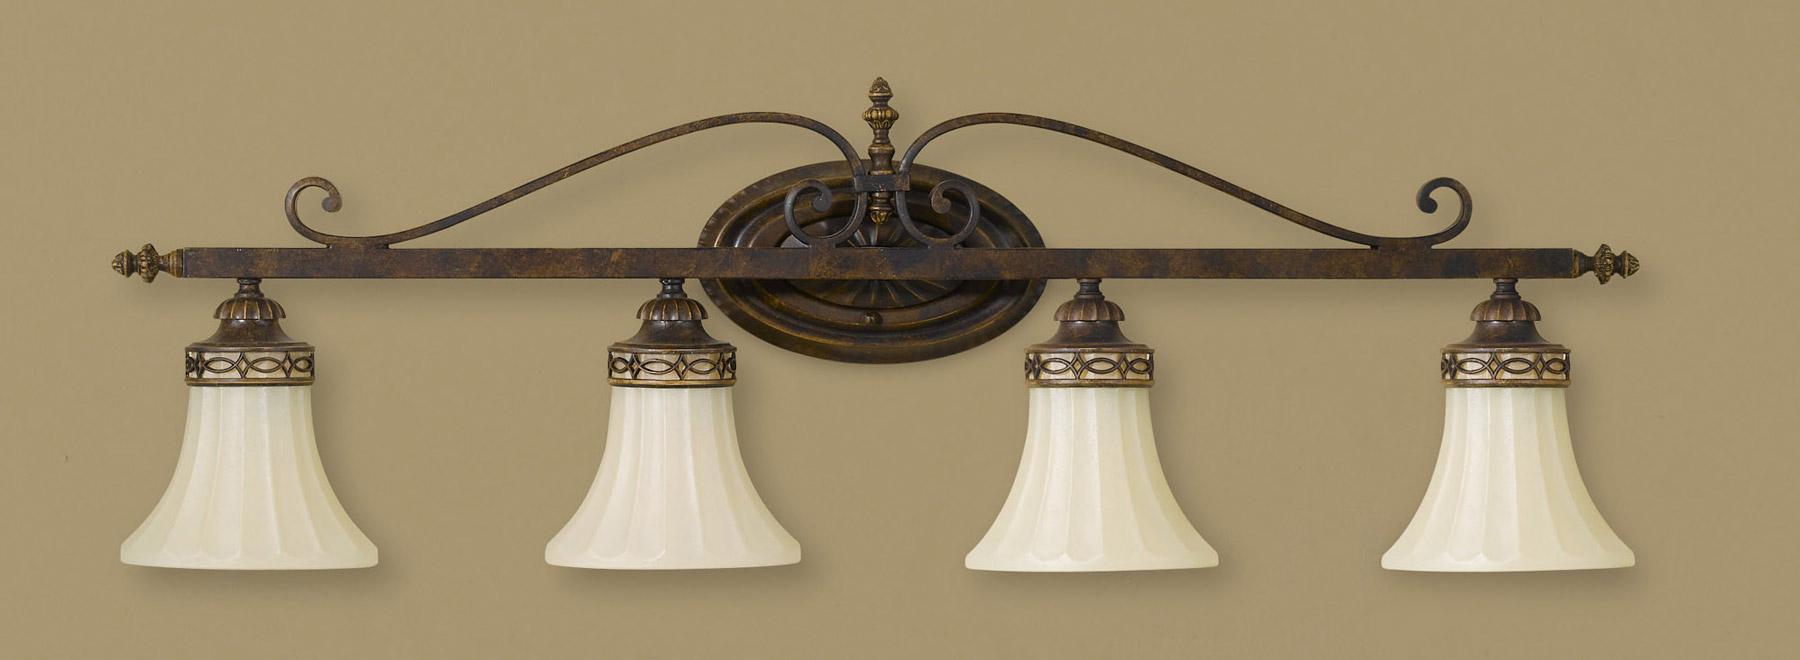 Feiss VS12504-WAL Drawing Room Vanity Light